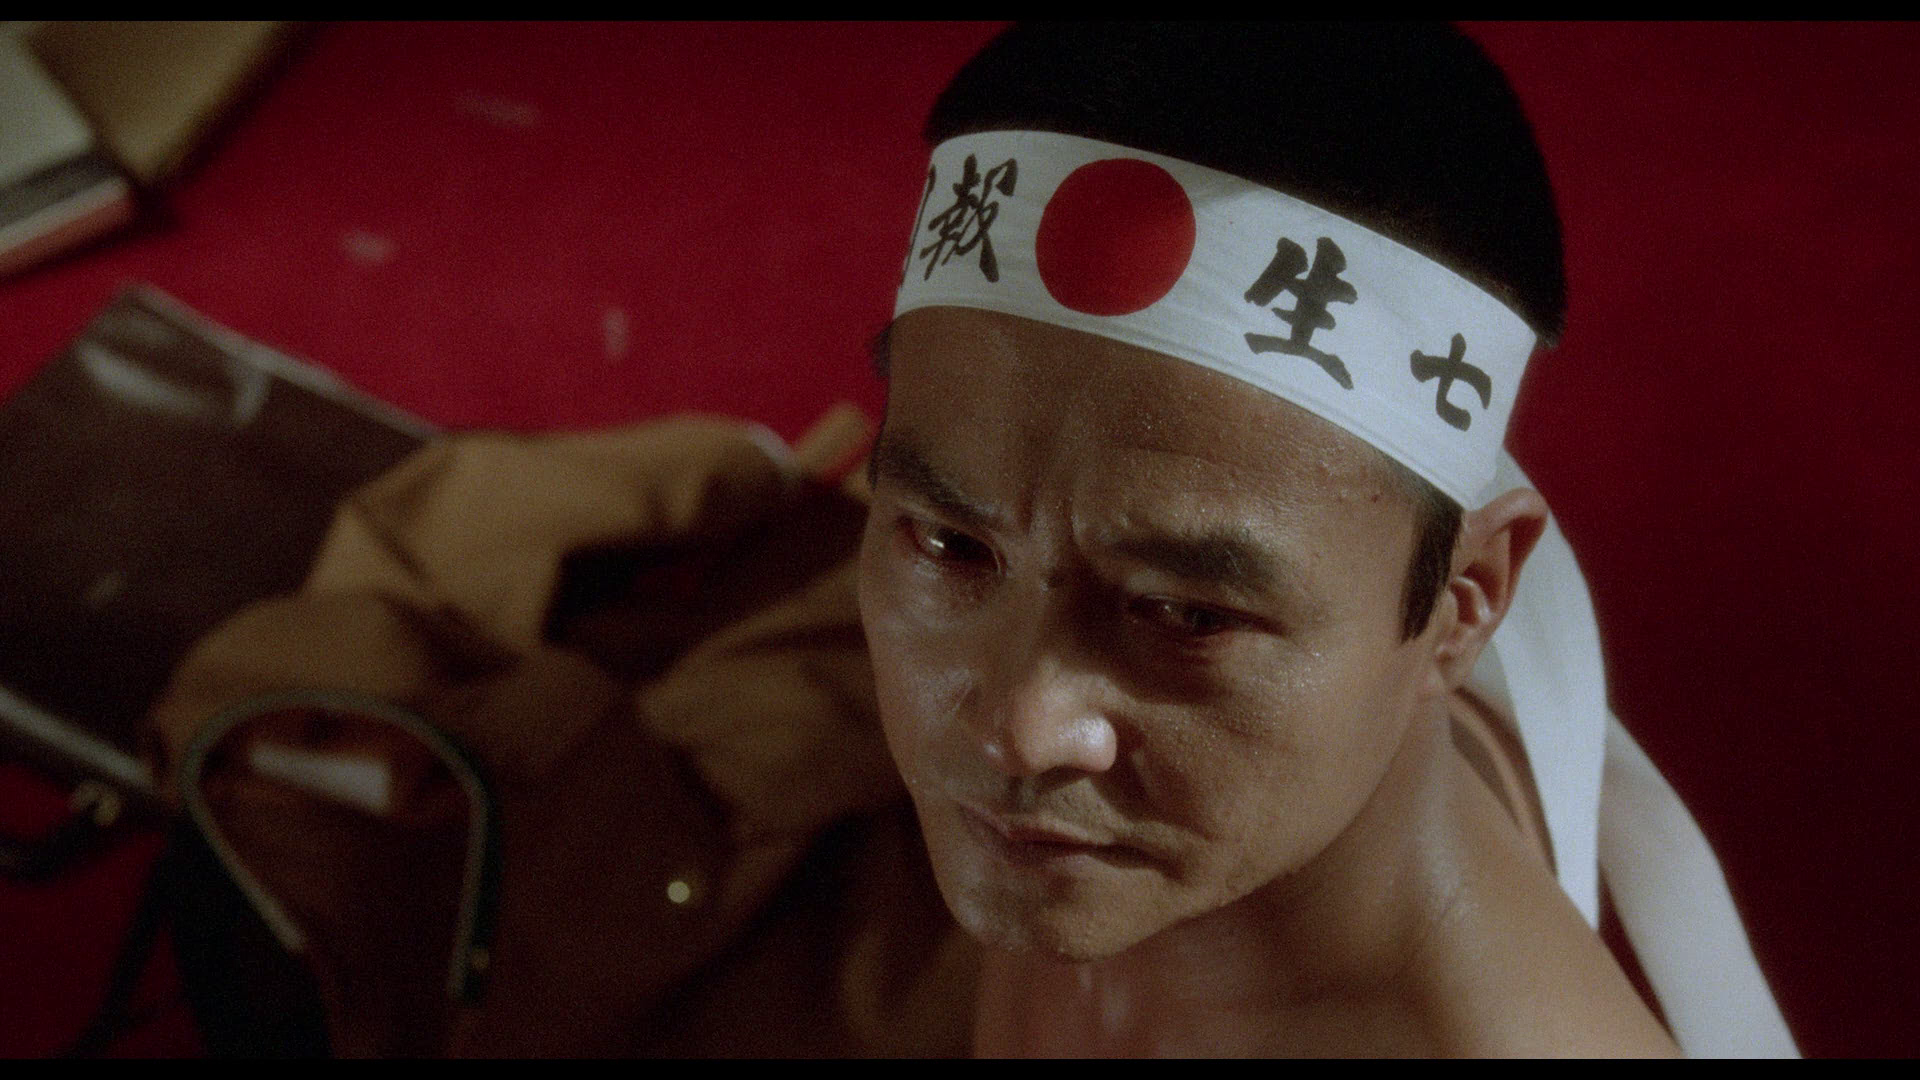 Ken Okada in Mishima